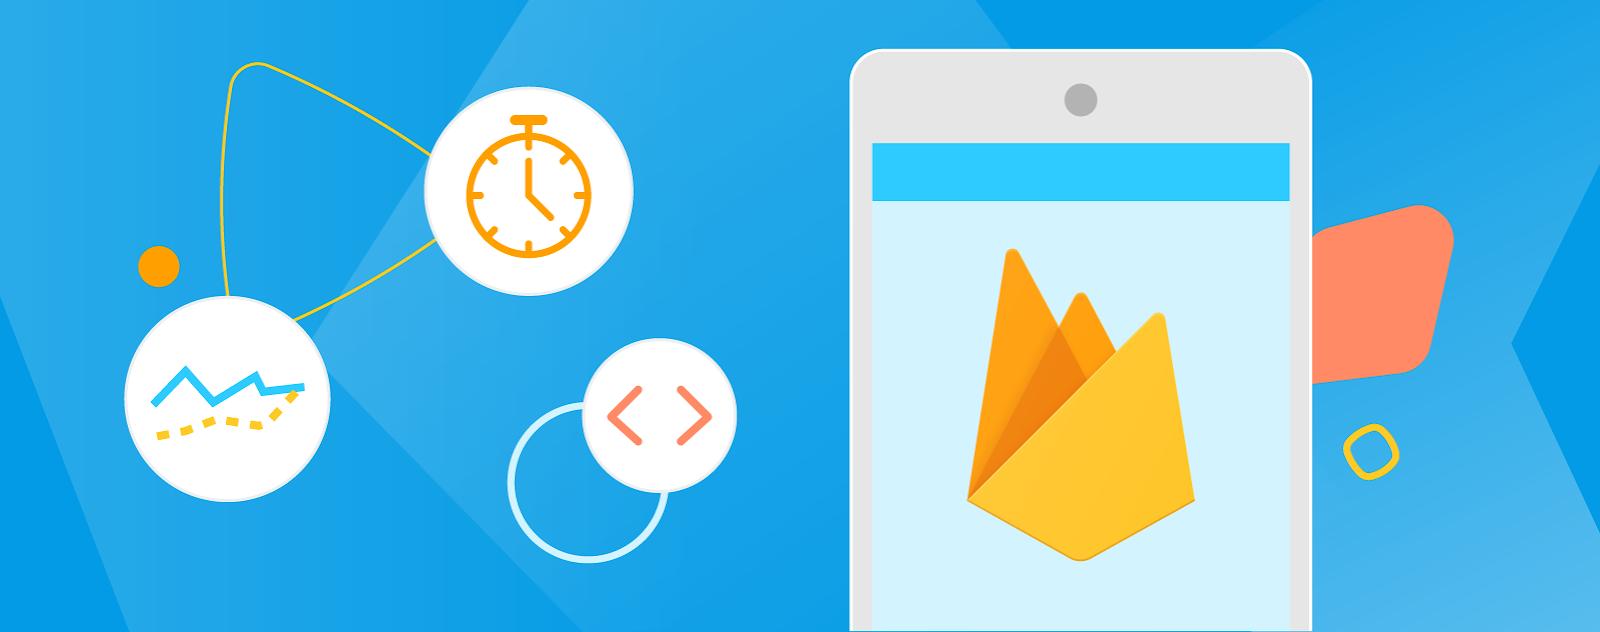 Firebase building apps image